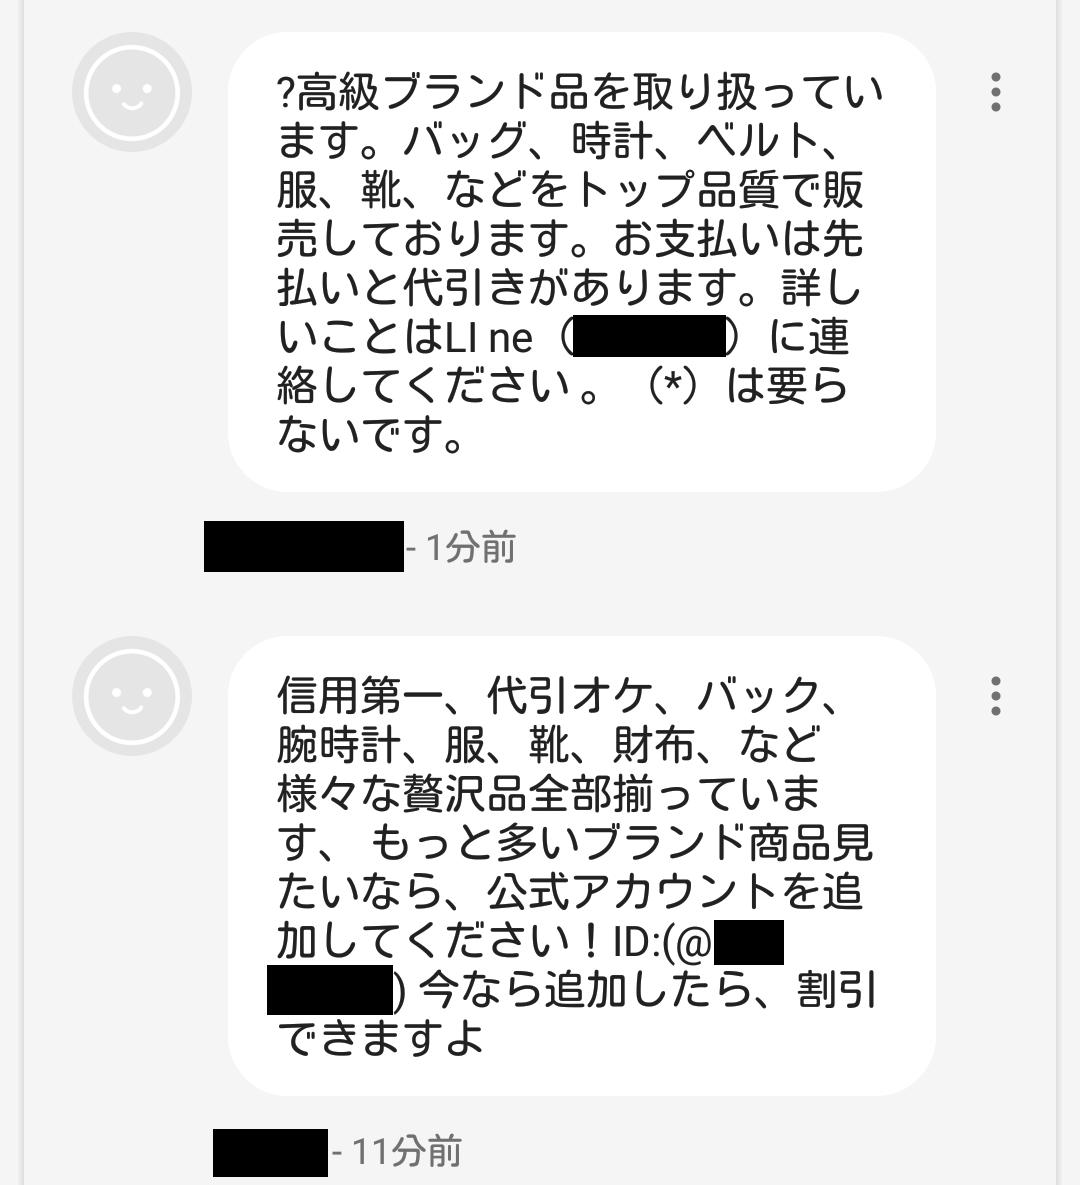 f:id:yotsumao:20190409131906p:plain